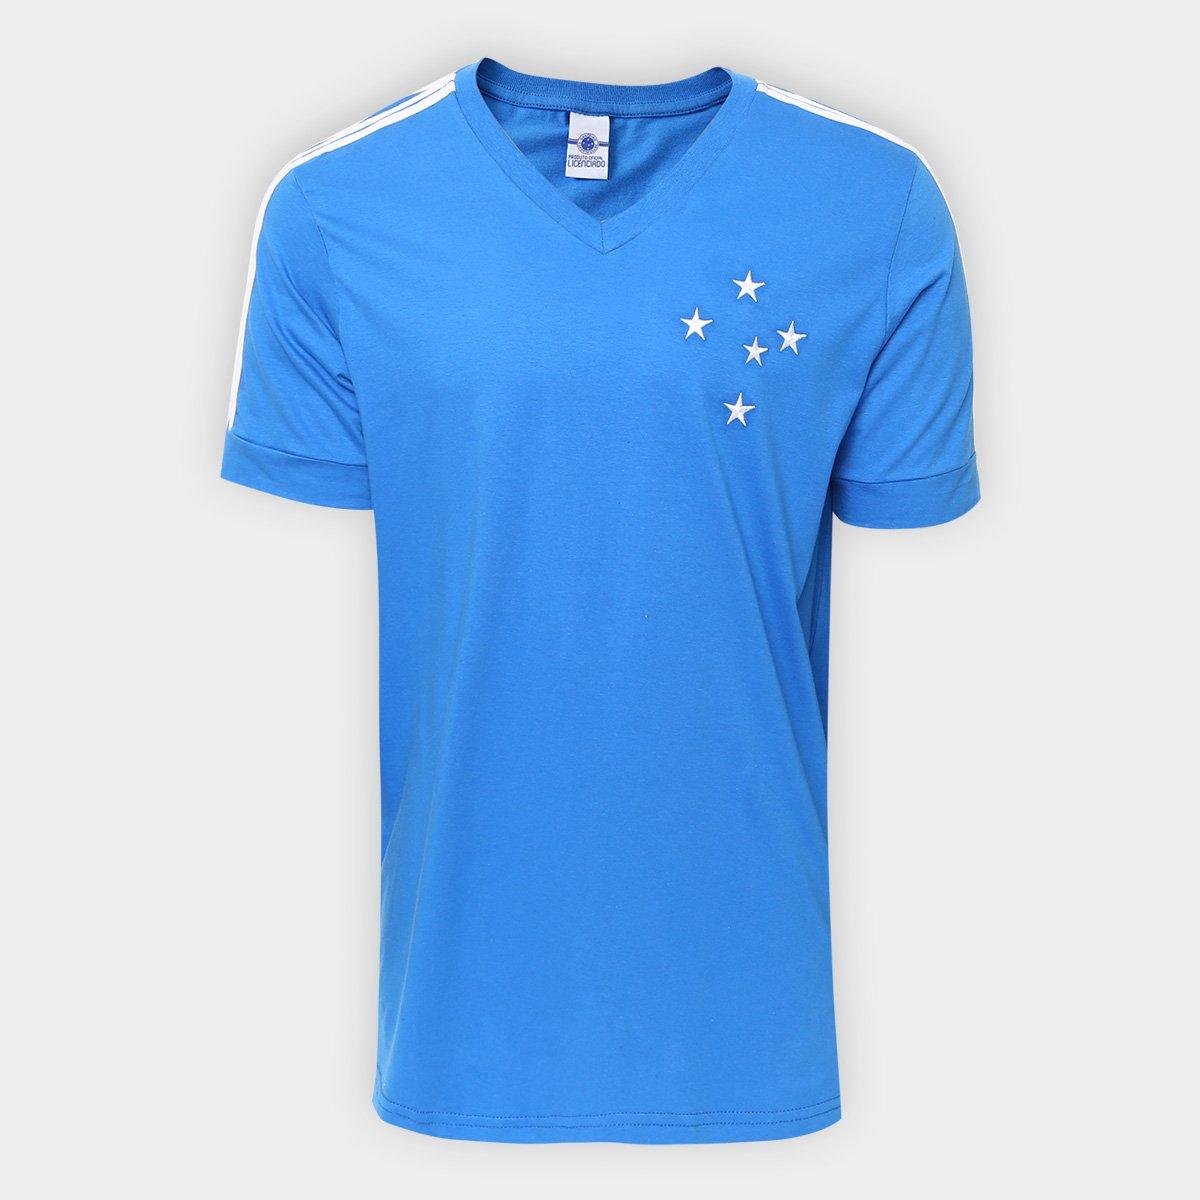 46c5764e463cc Camiseta Cruzeiro Réplica 1987 Masculina